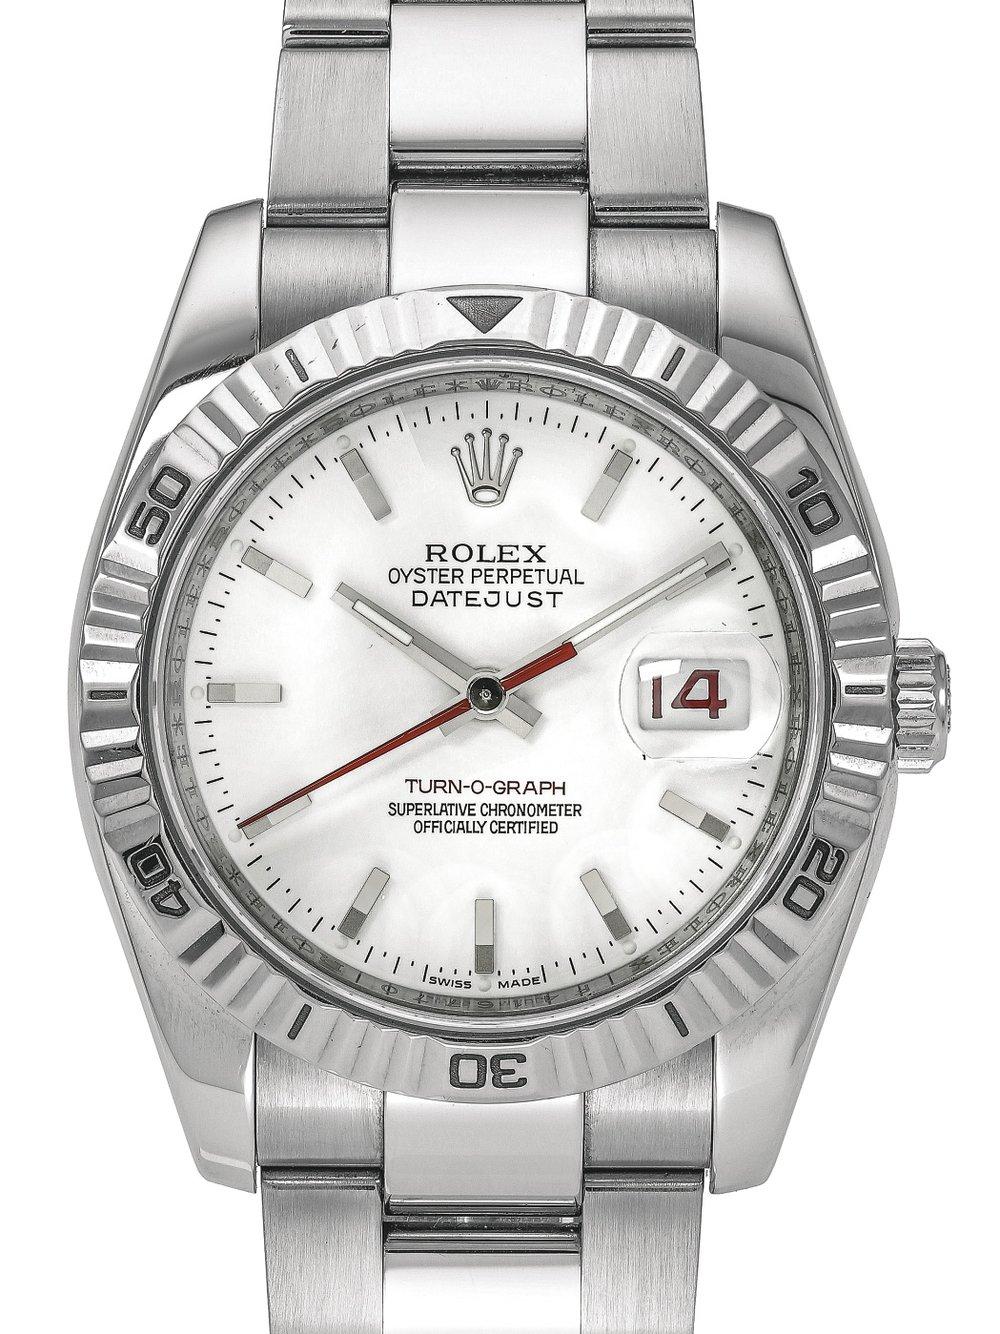 Rolex Datejust Turn-o-graph Ref. 116264